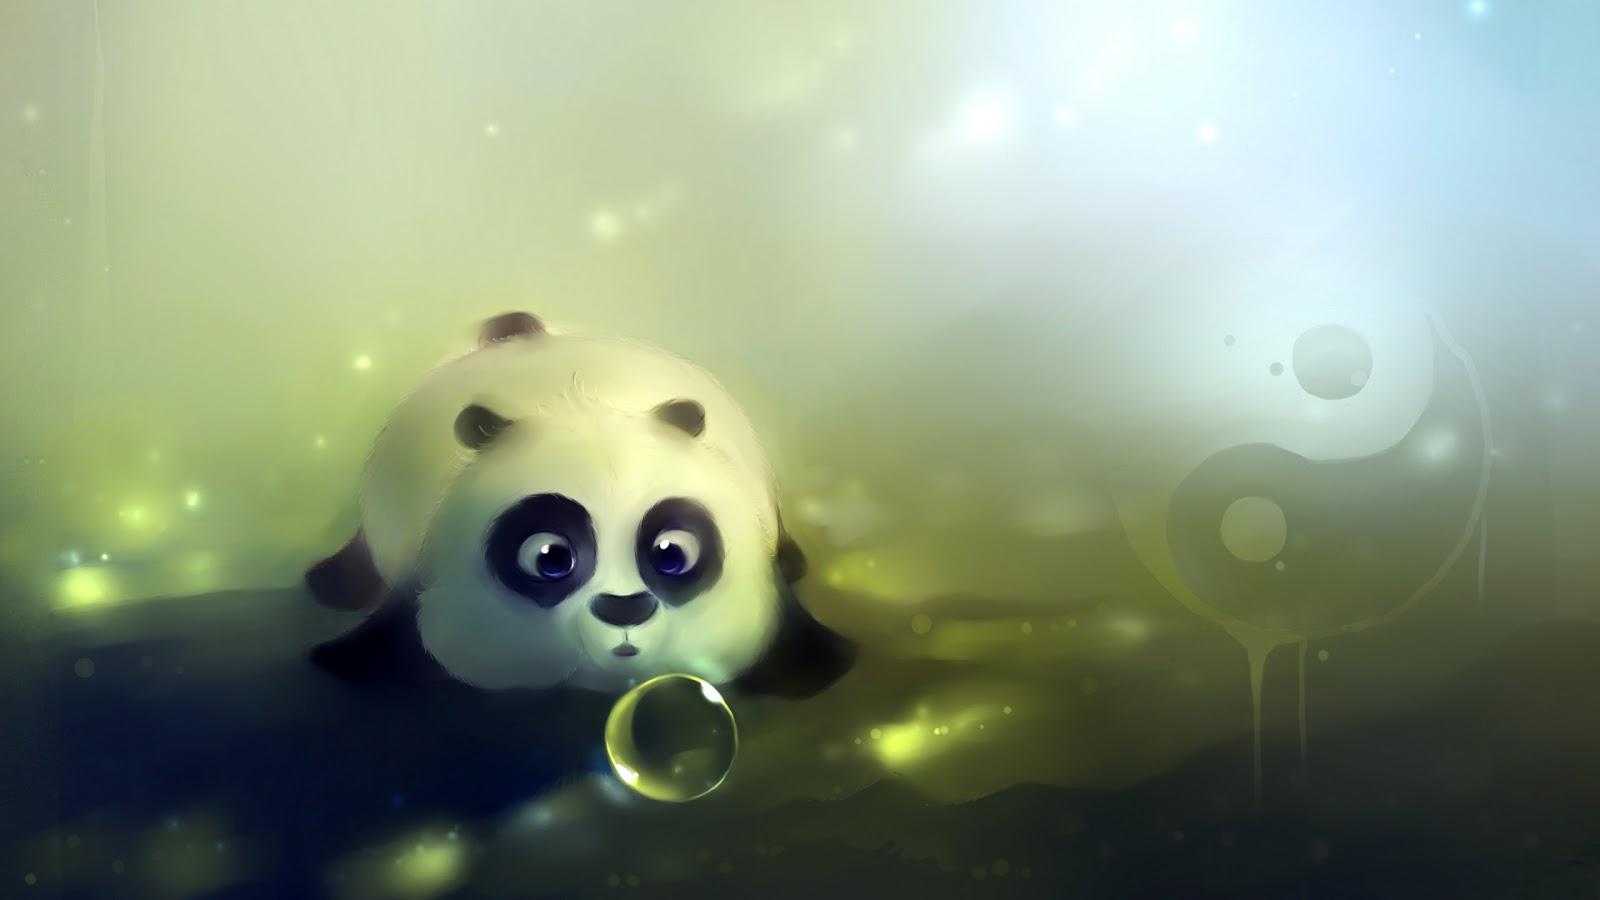 Fondo de Pantalla Animales Oso panda con burbuja   Imagenes ZT 1600x900